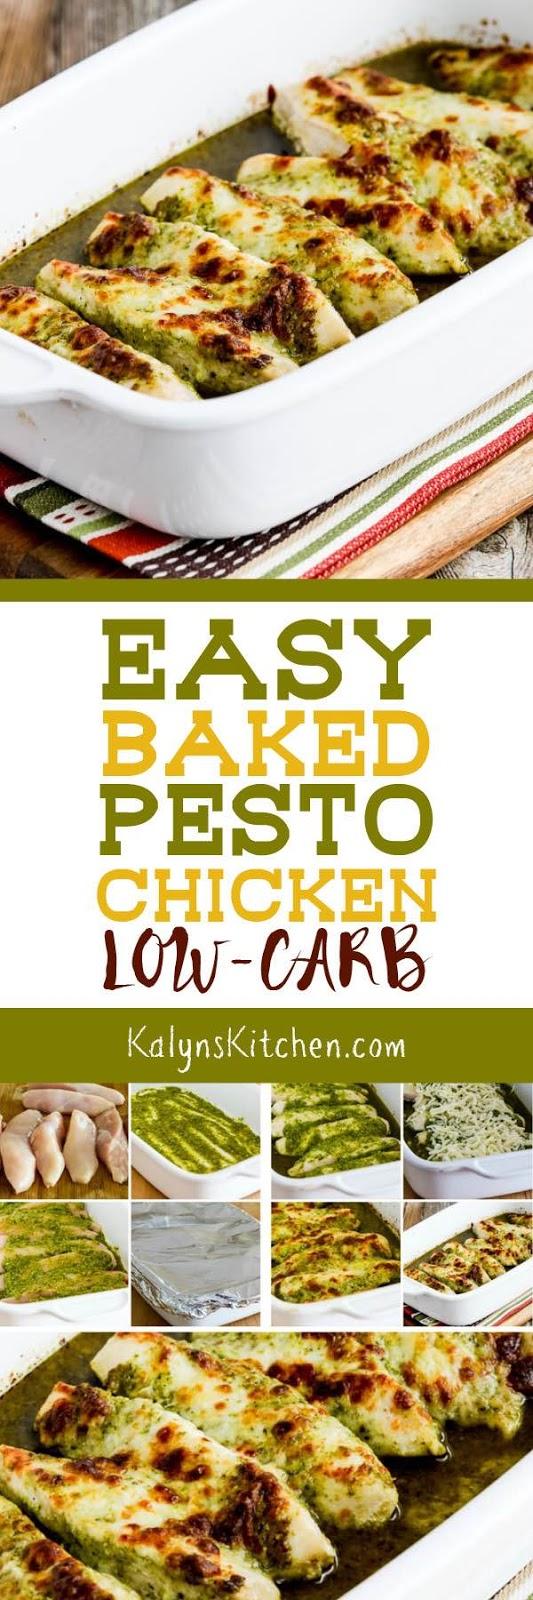 Easy Baked Pesto Chicken found on KalynsKitchen.com